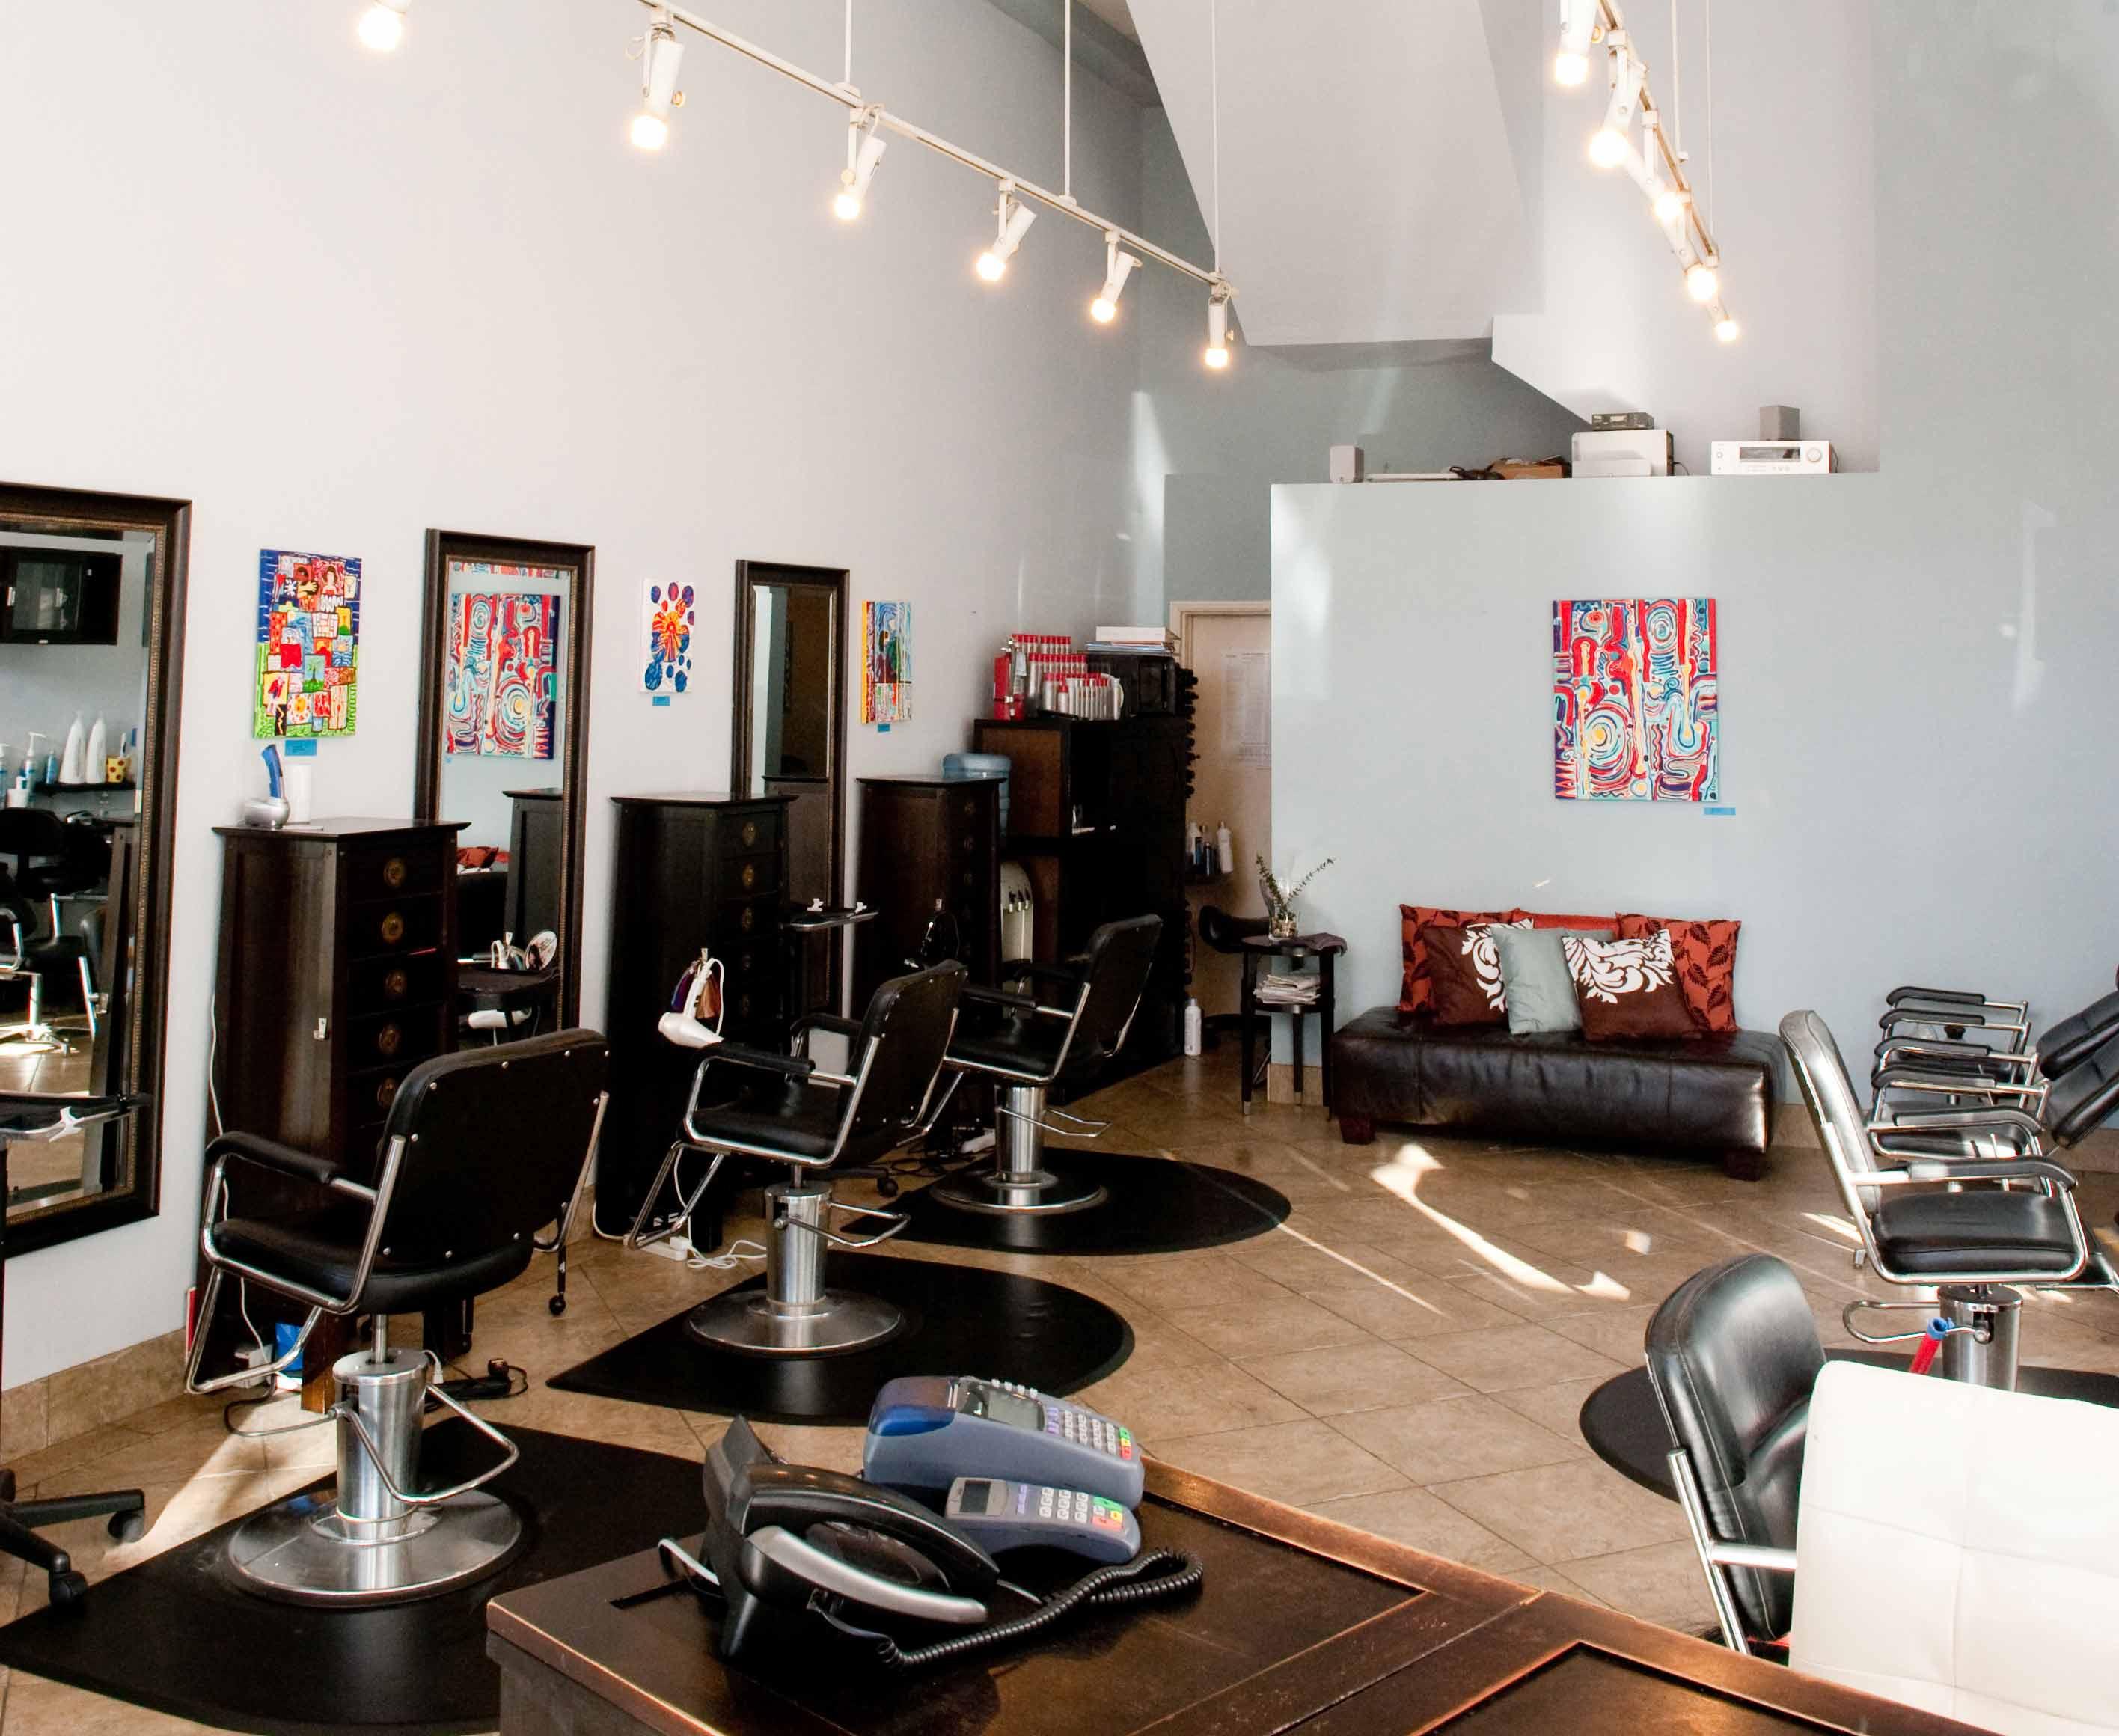 Hair Salon Background Lucero hair salon in oakland 2832x2320